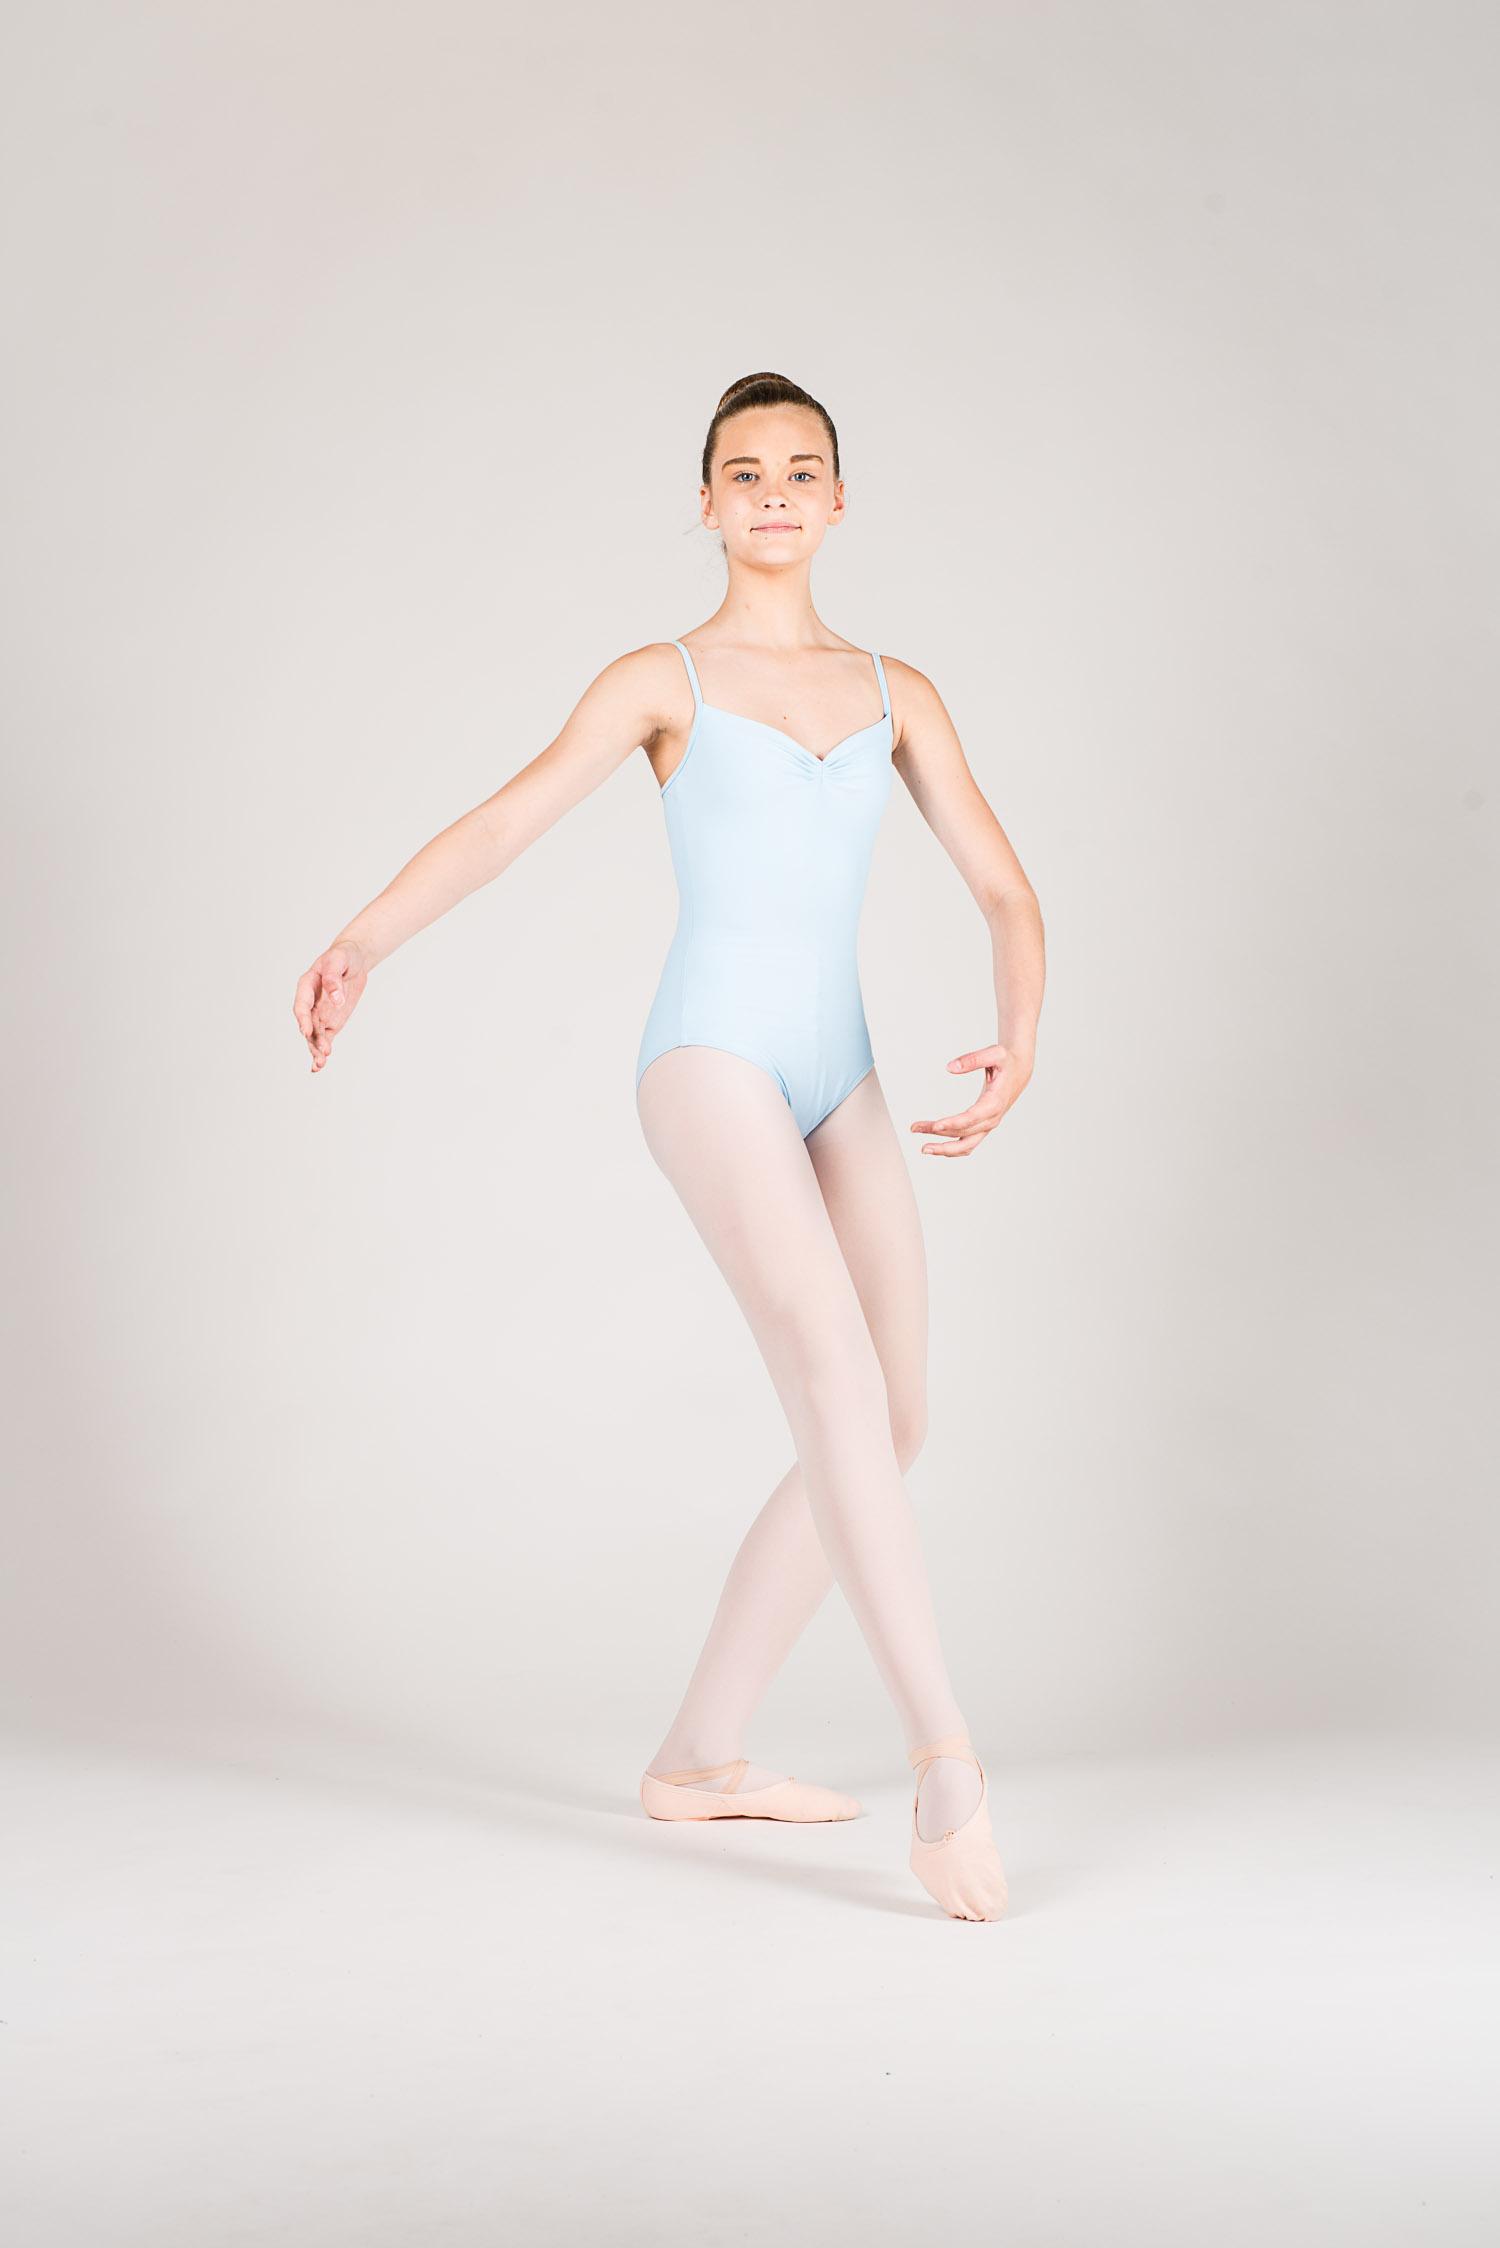 Justaucorps danse enfant Wear Moi sky - Mademoiselle Danse bda147c2d11